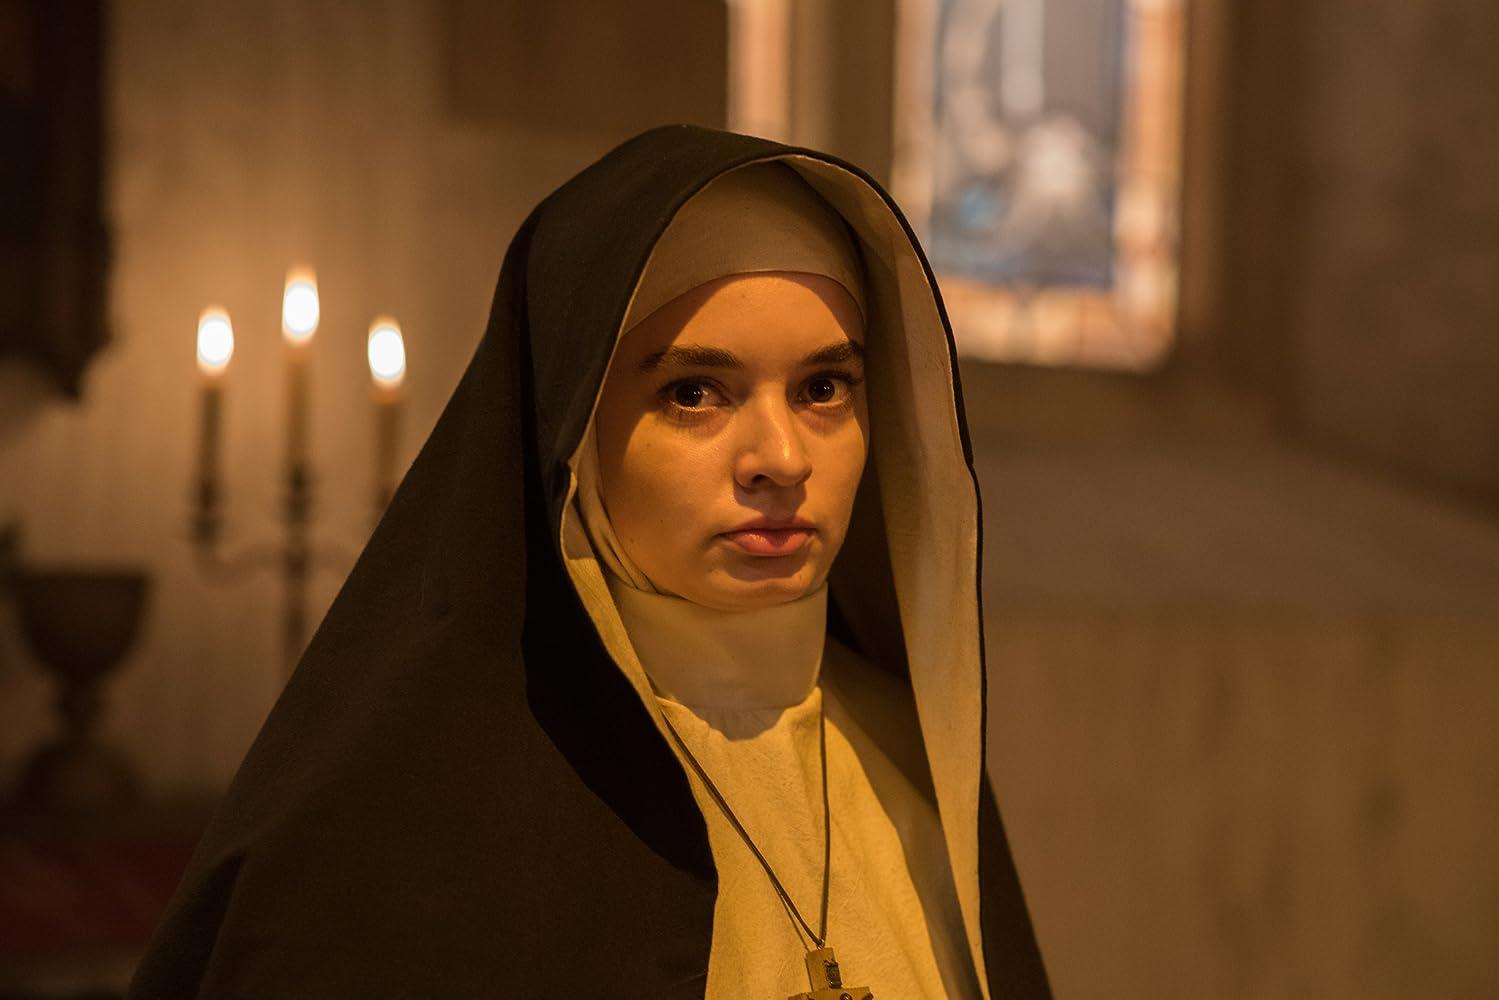 Ingrid Bisu in The Nun (2018)